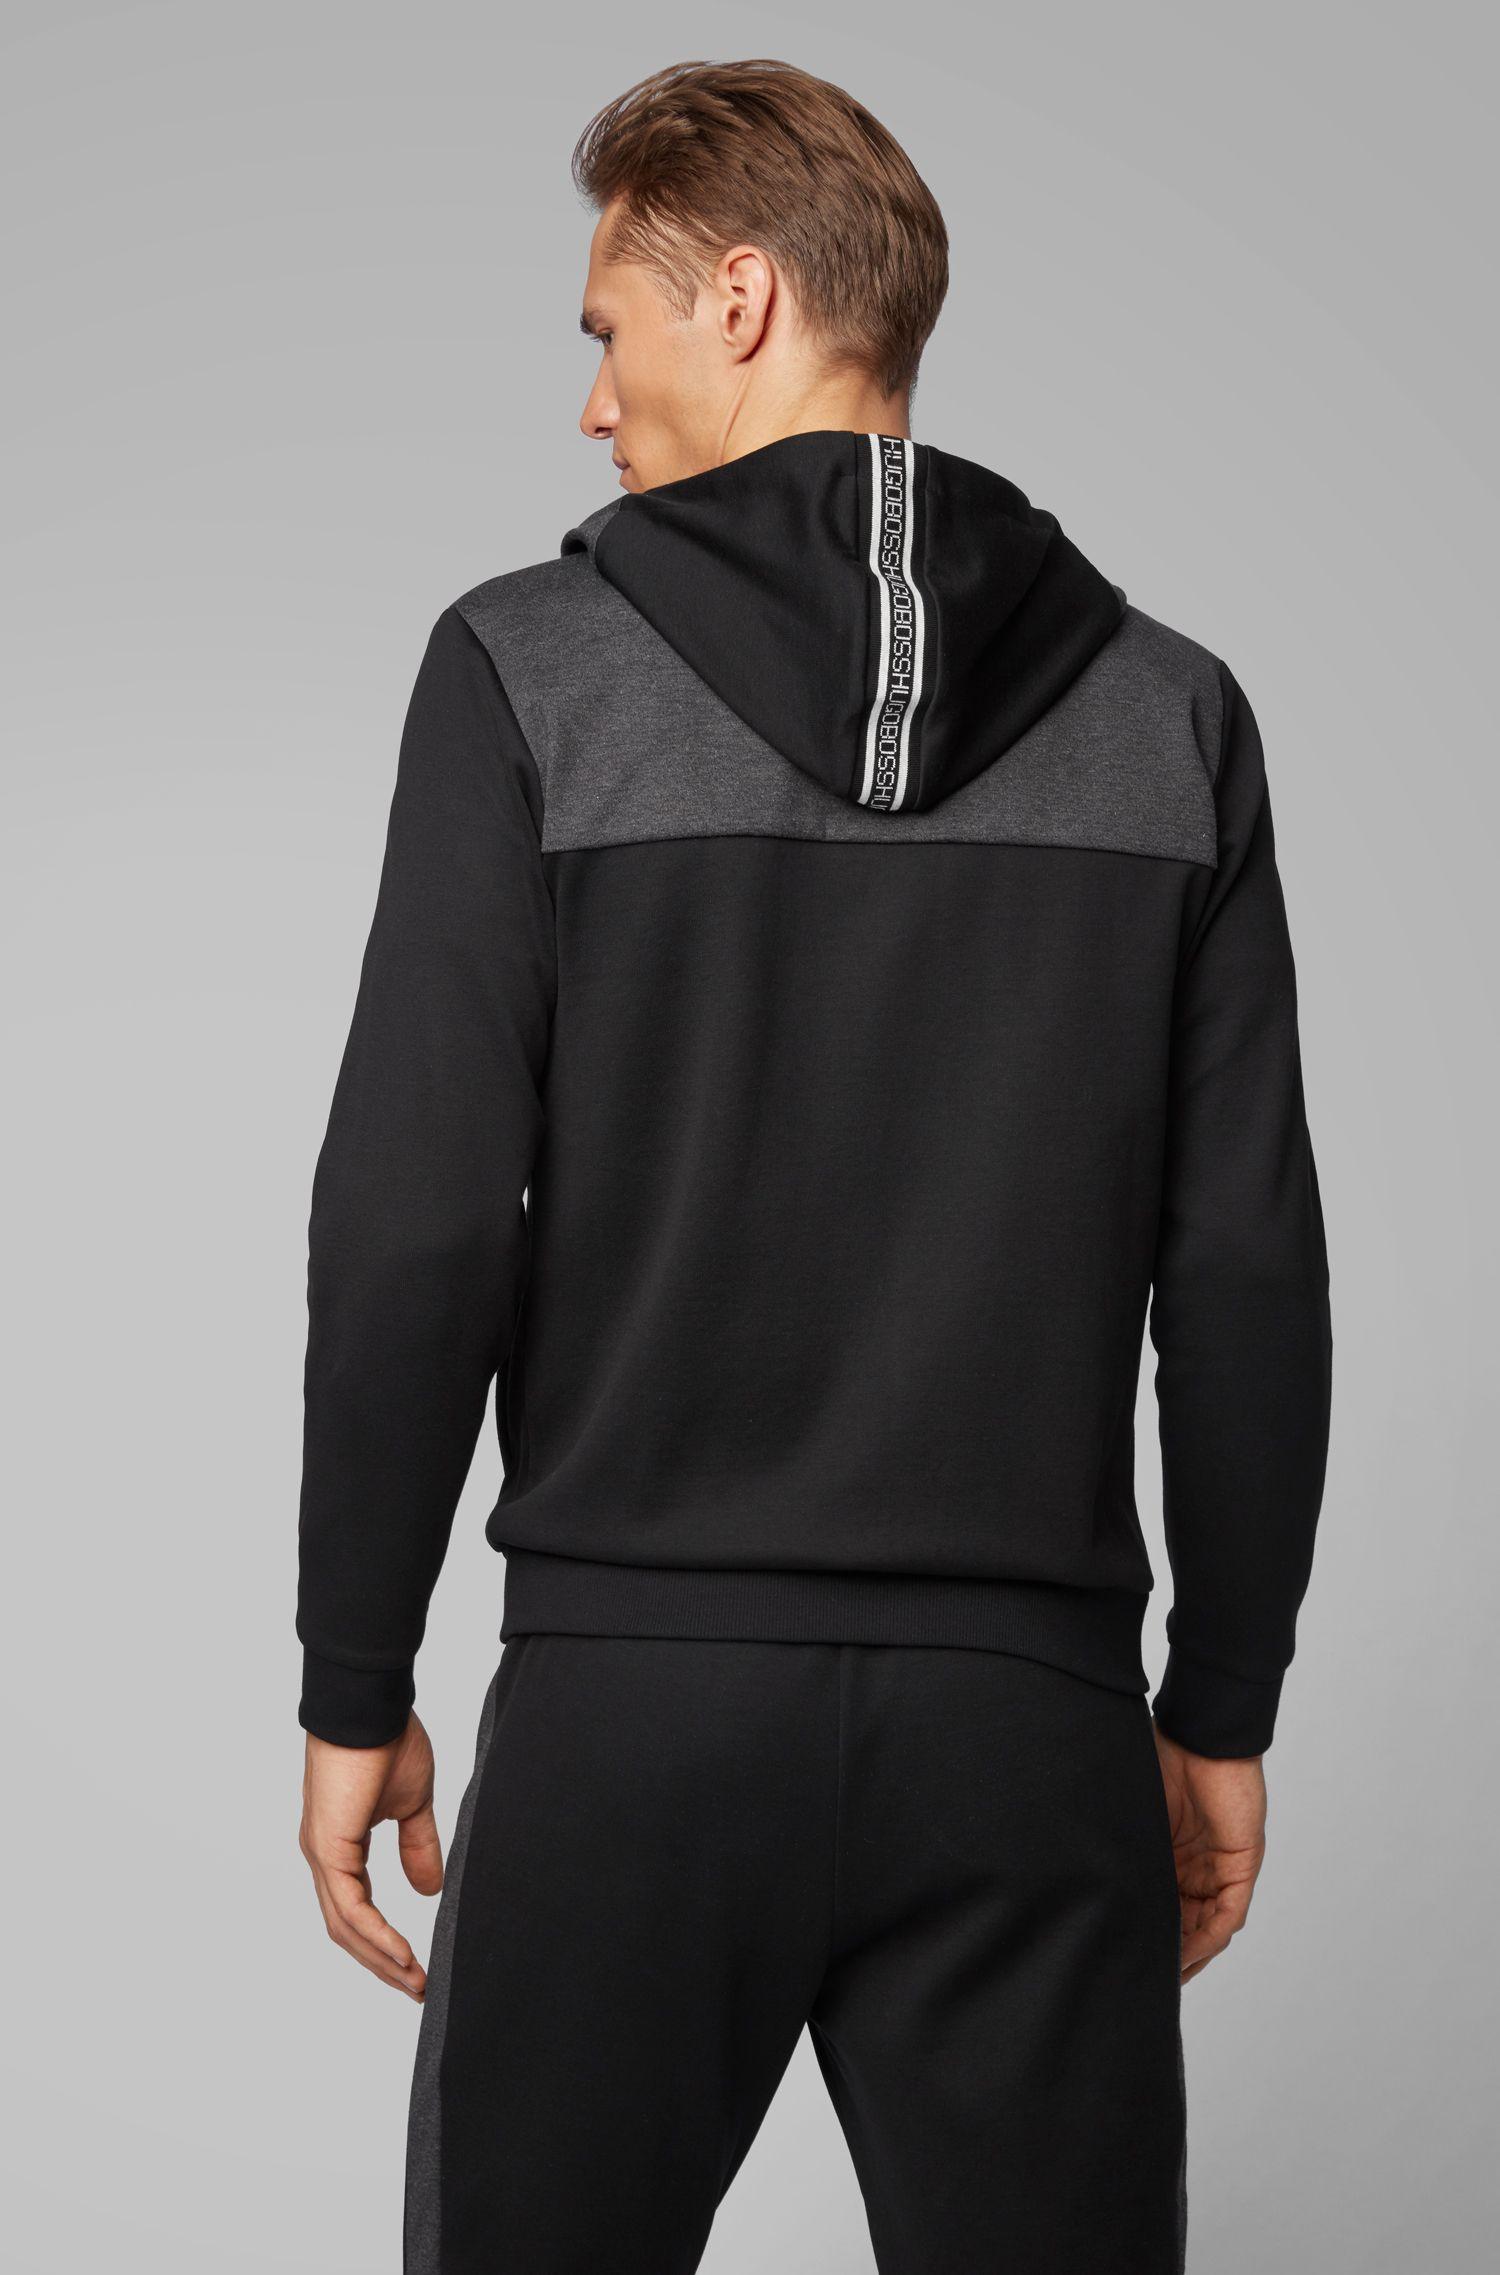 Zip-through hooded sweatshirt with curved logo, Black